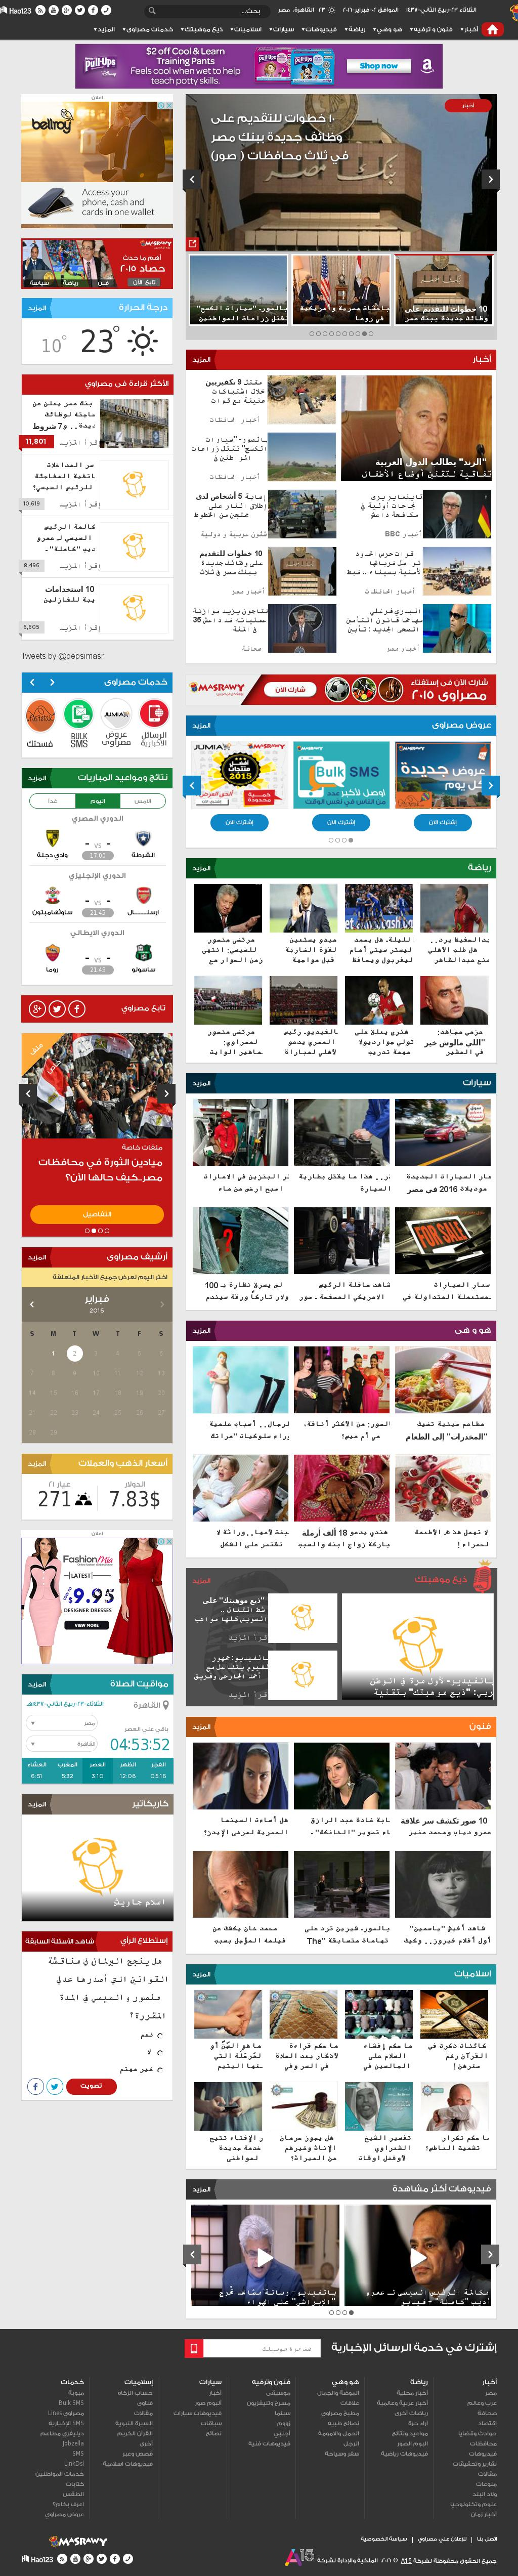 Masrawy at Tuesday Feb. 2, 2016, 10:15 a.m. UTC